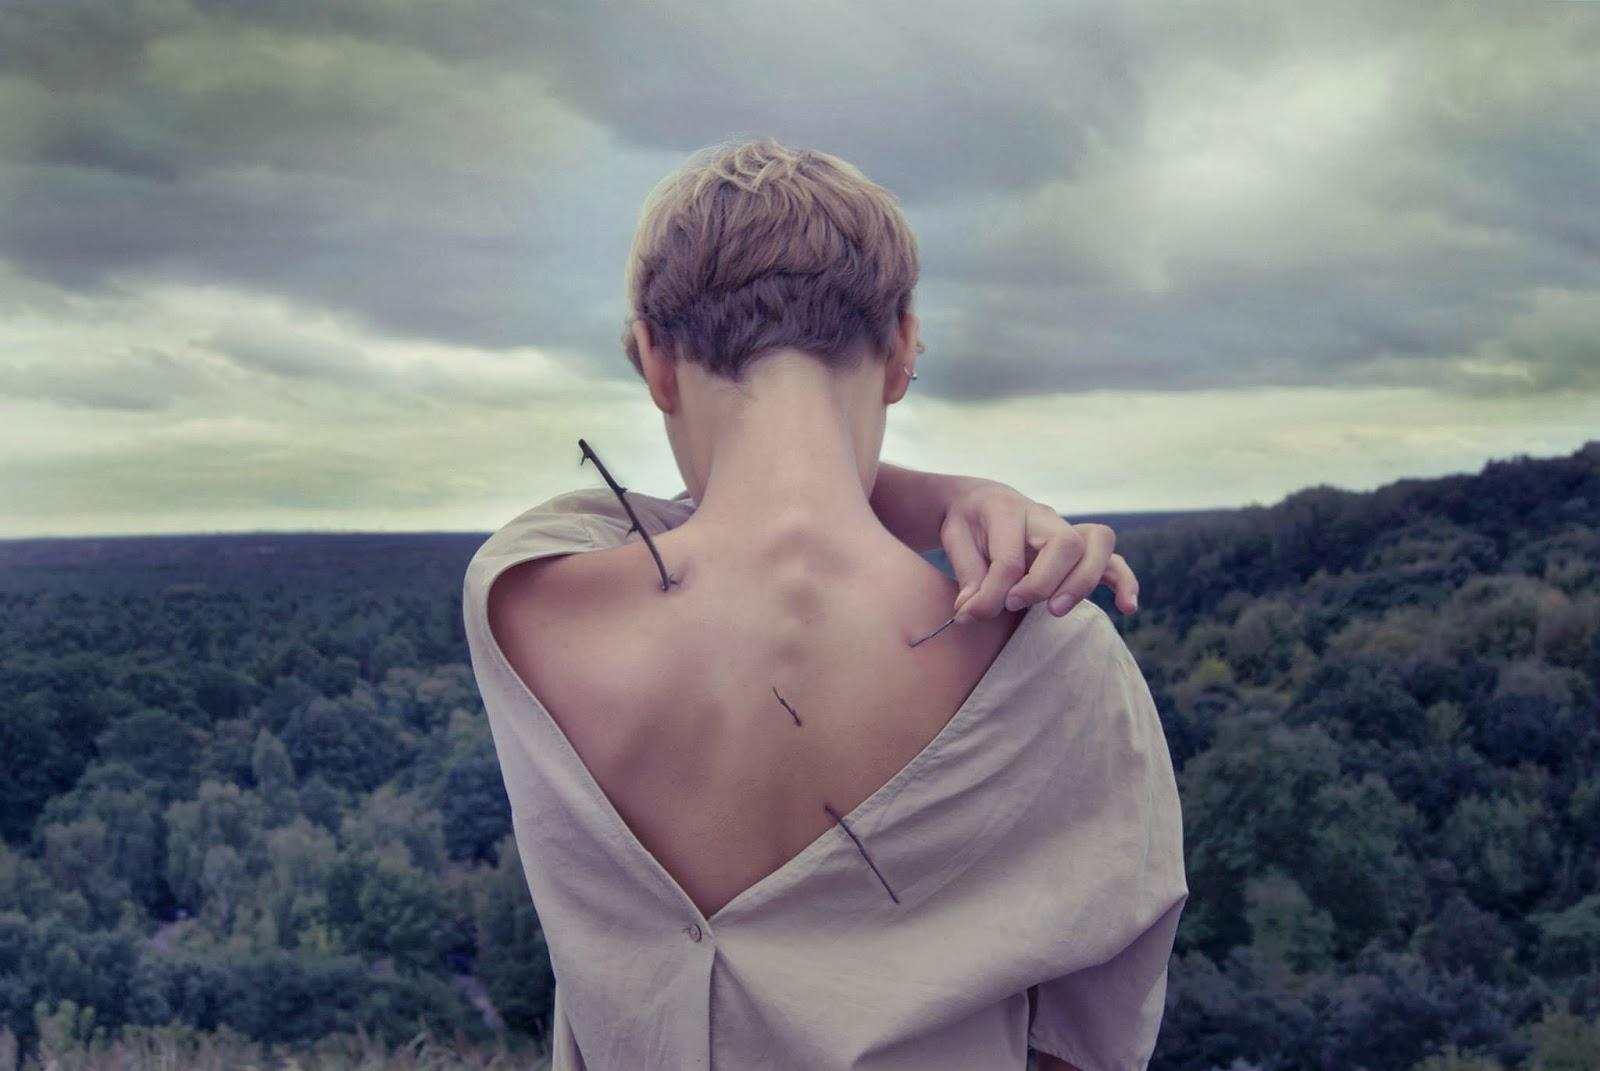 ©Arlette Chiara Sivizaca Conde - Lai tā būtu photography